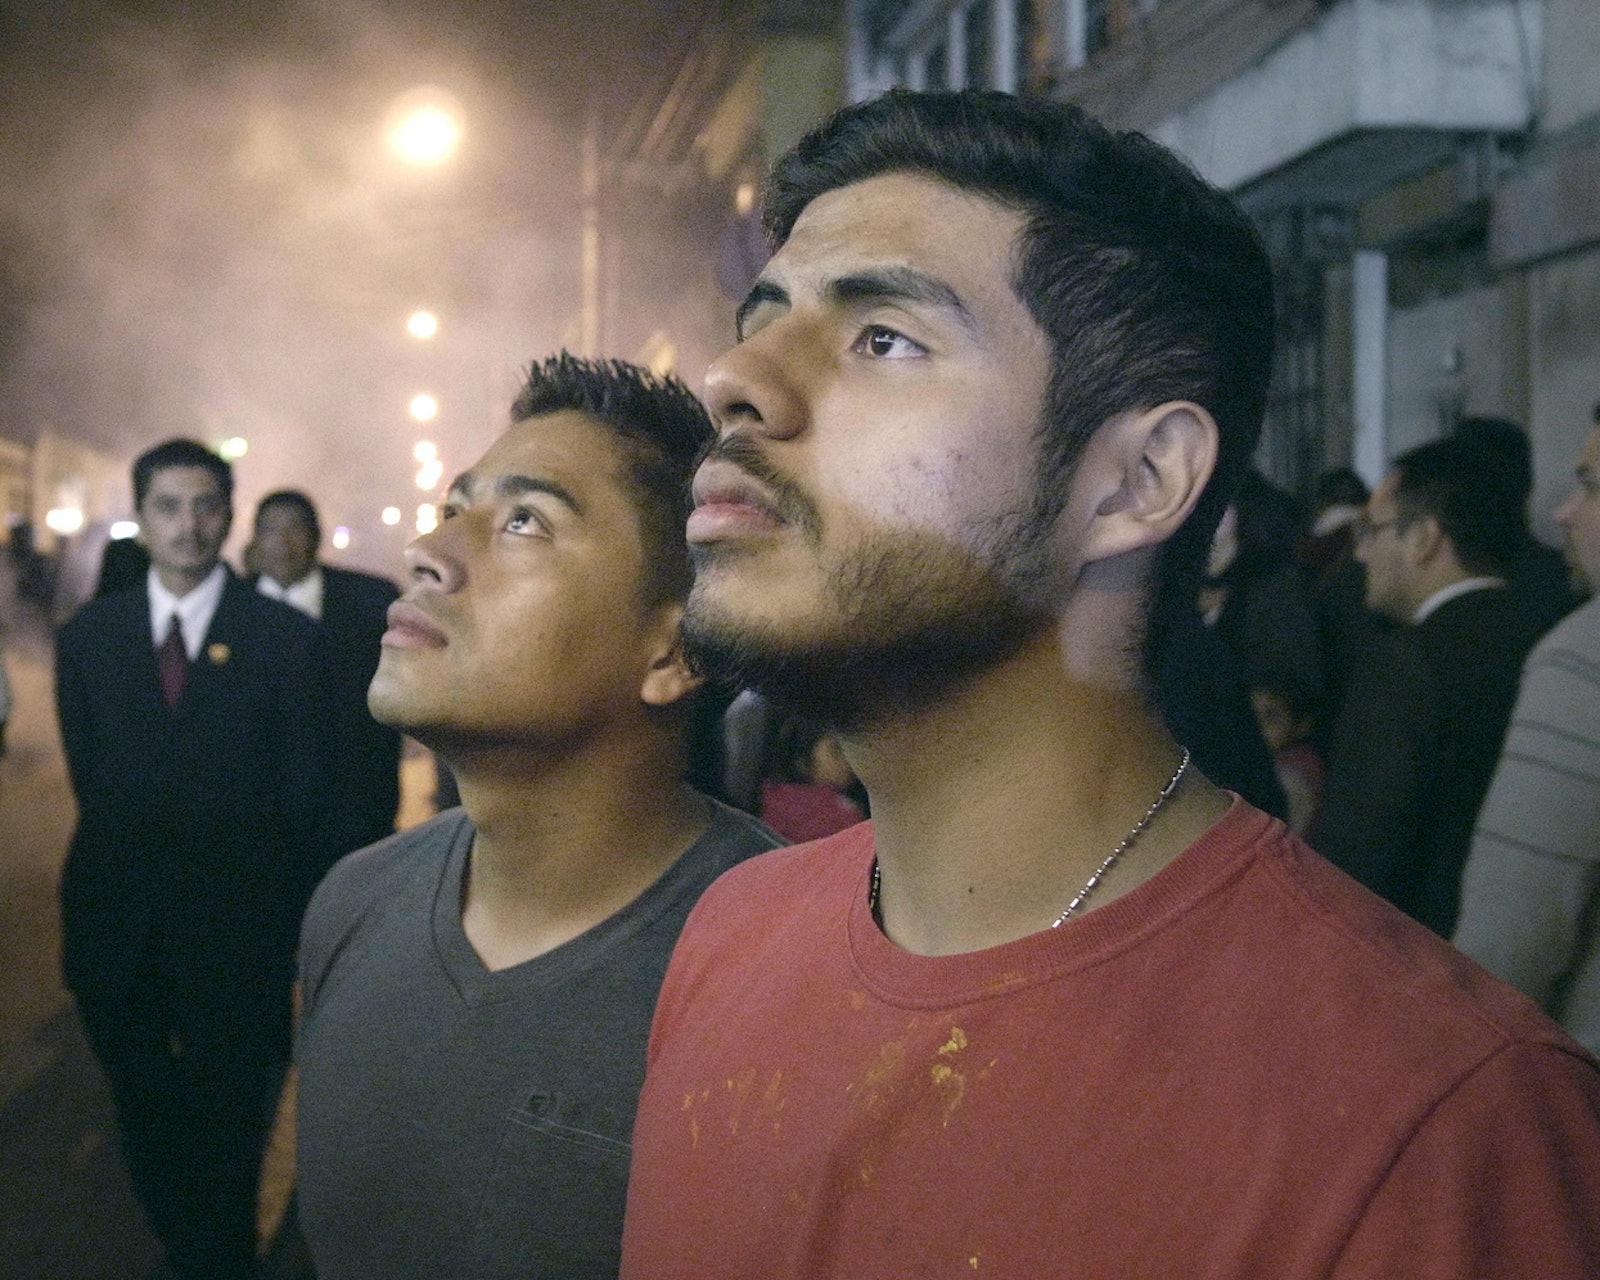 18140-007-JoseArticle - Lead actors in JOSE, (left) Enrique Salanic and (right) Monolo Herrera.  Scene from the movie. (supplied)